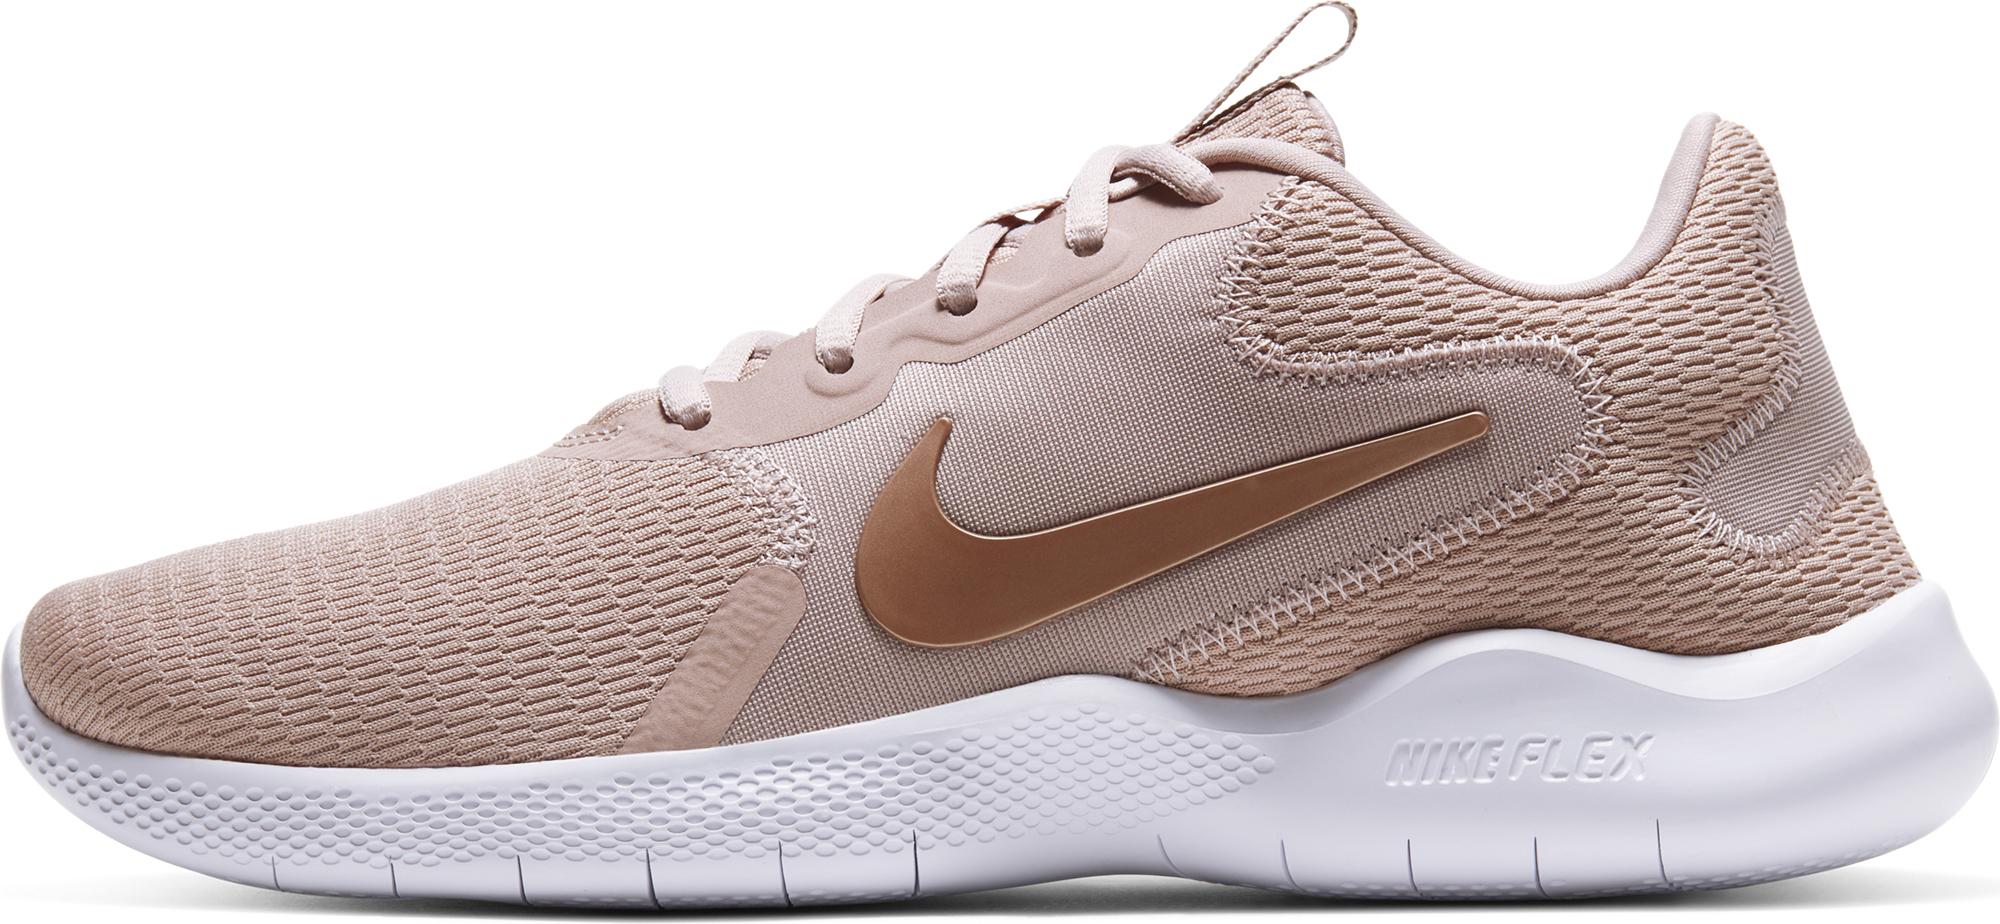 цены Nike Кроссовки женские Nike Flex Experience Run 9, размер 35